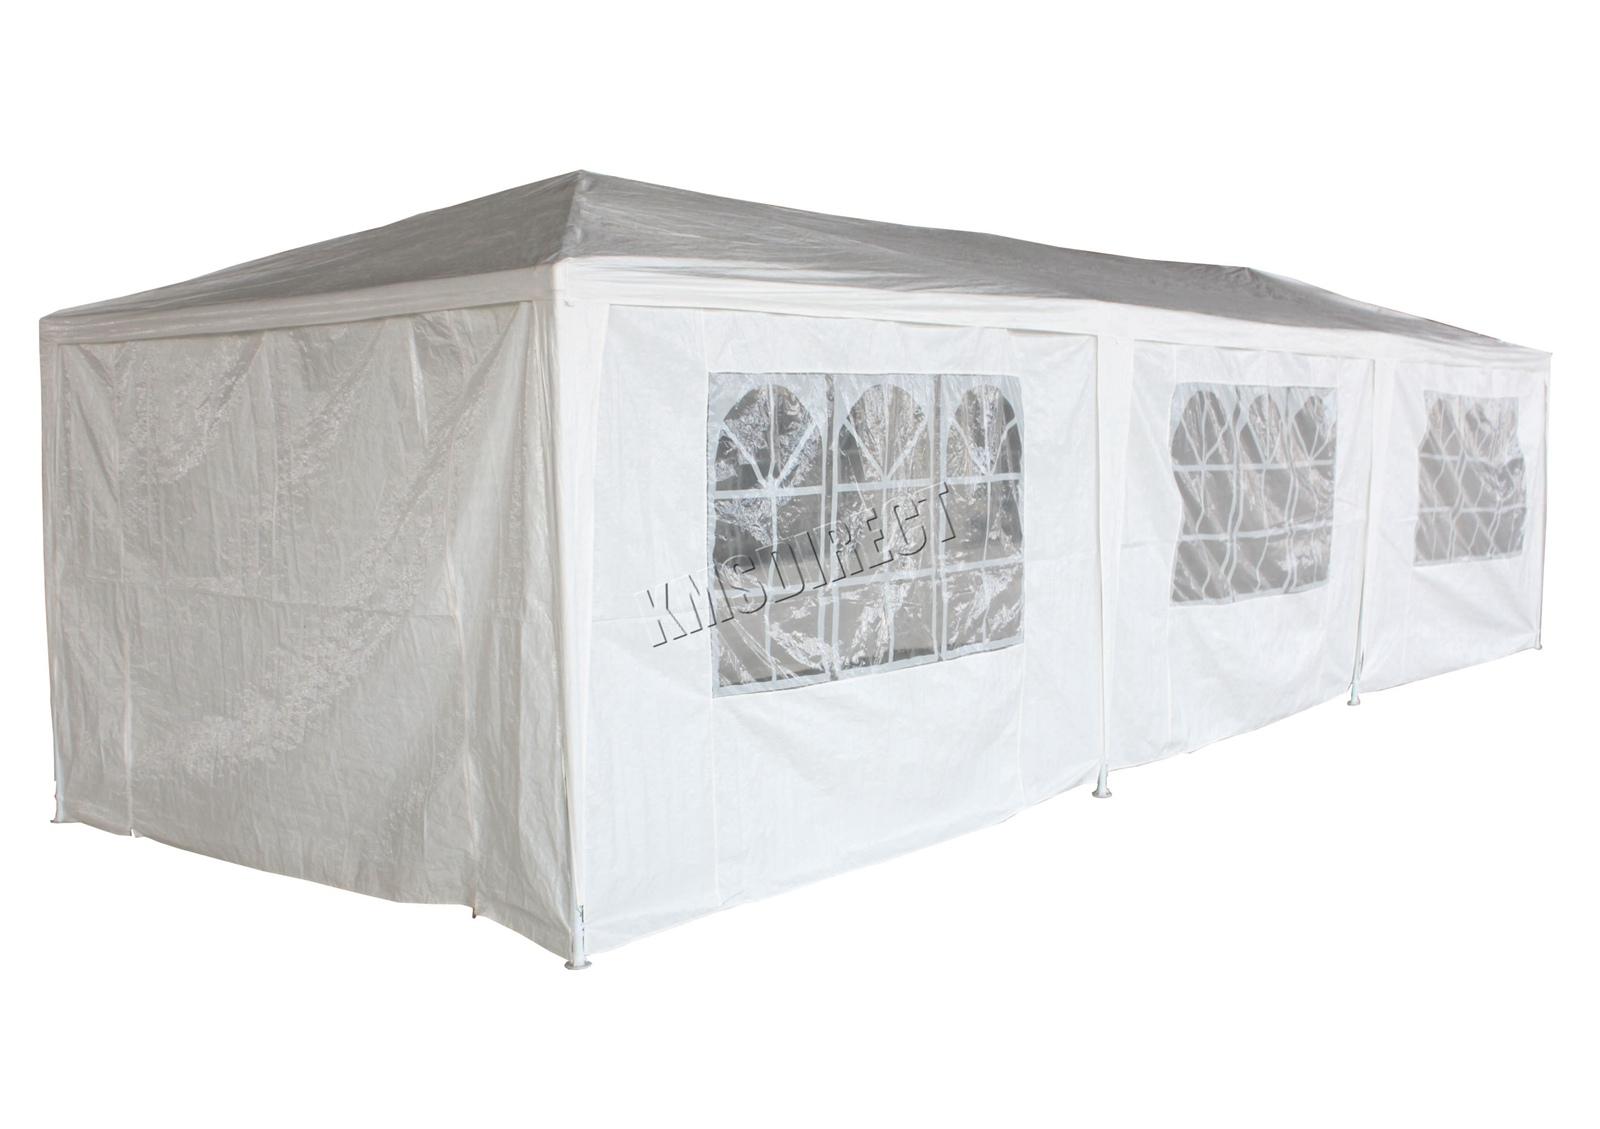 Panana 3x6m Garden Gazebo Outdoor Party Tent Waterproof Marquee Canopy Wedding